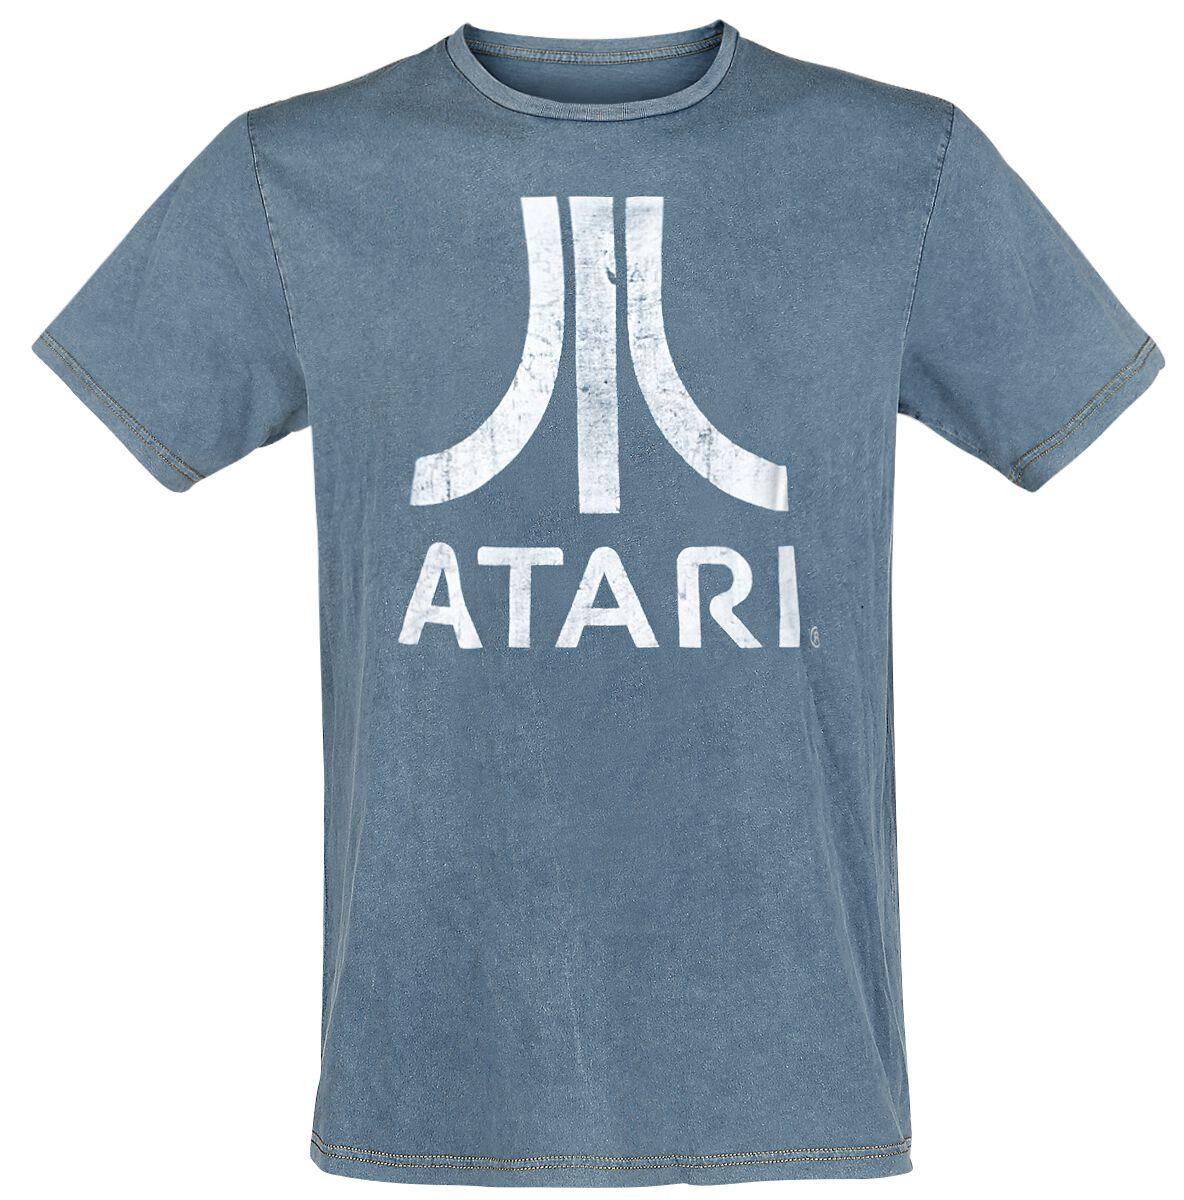 Merch dla Fanów - Koszulki - T-Shirt Atari Logo T-Shirt niebieski - 376403